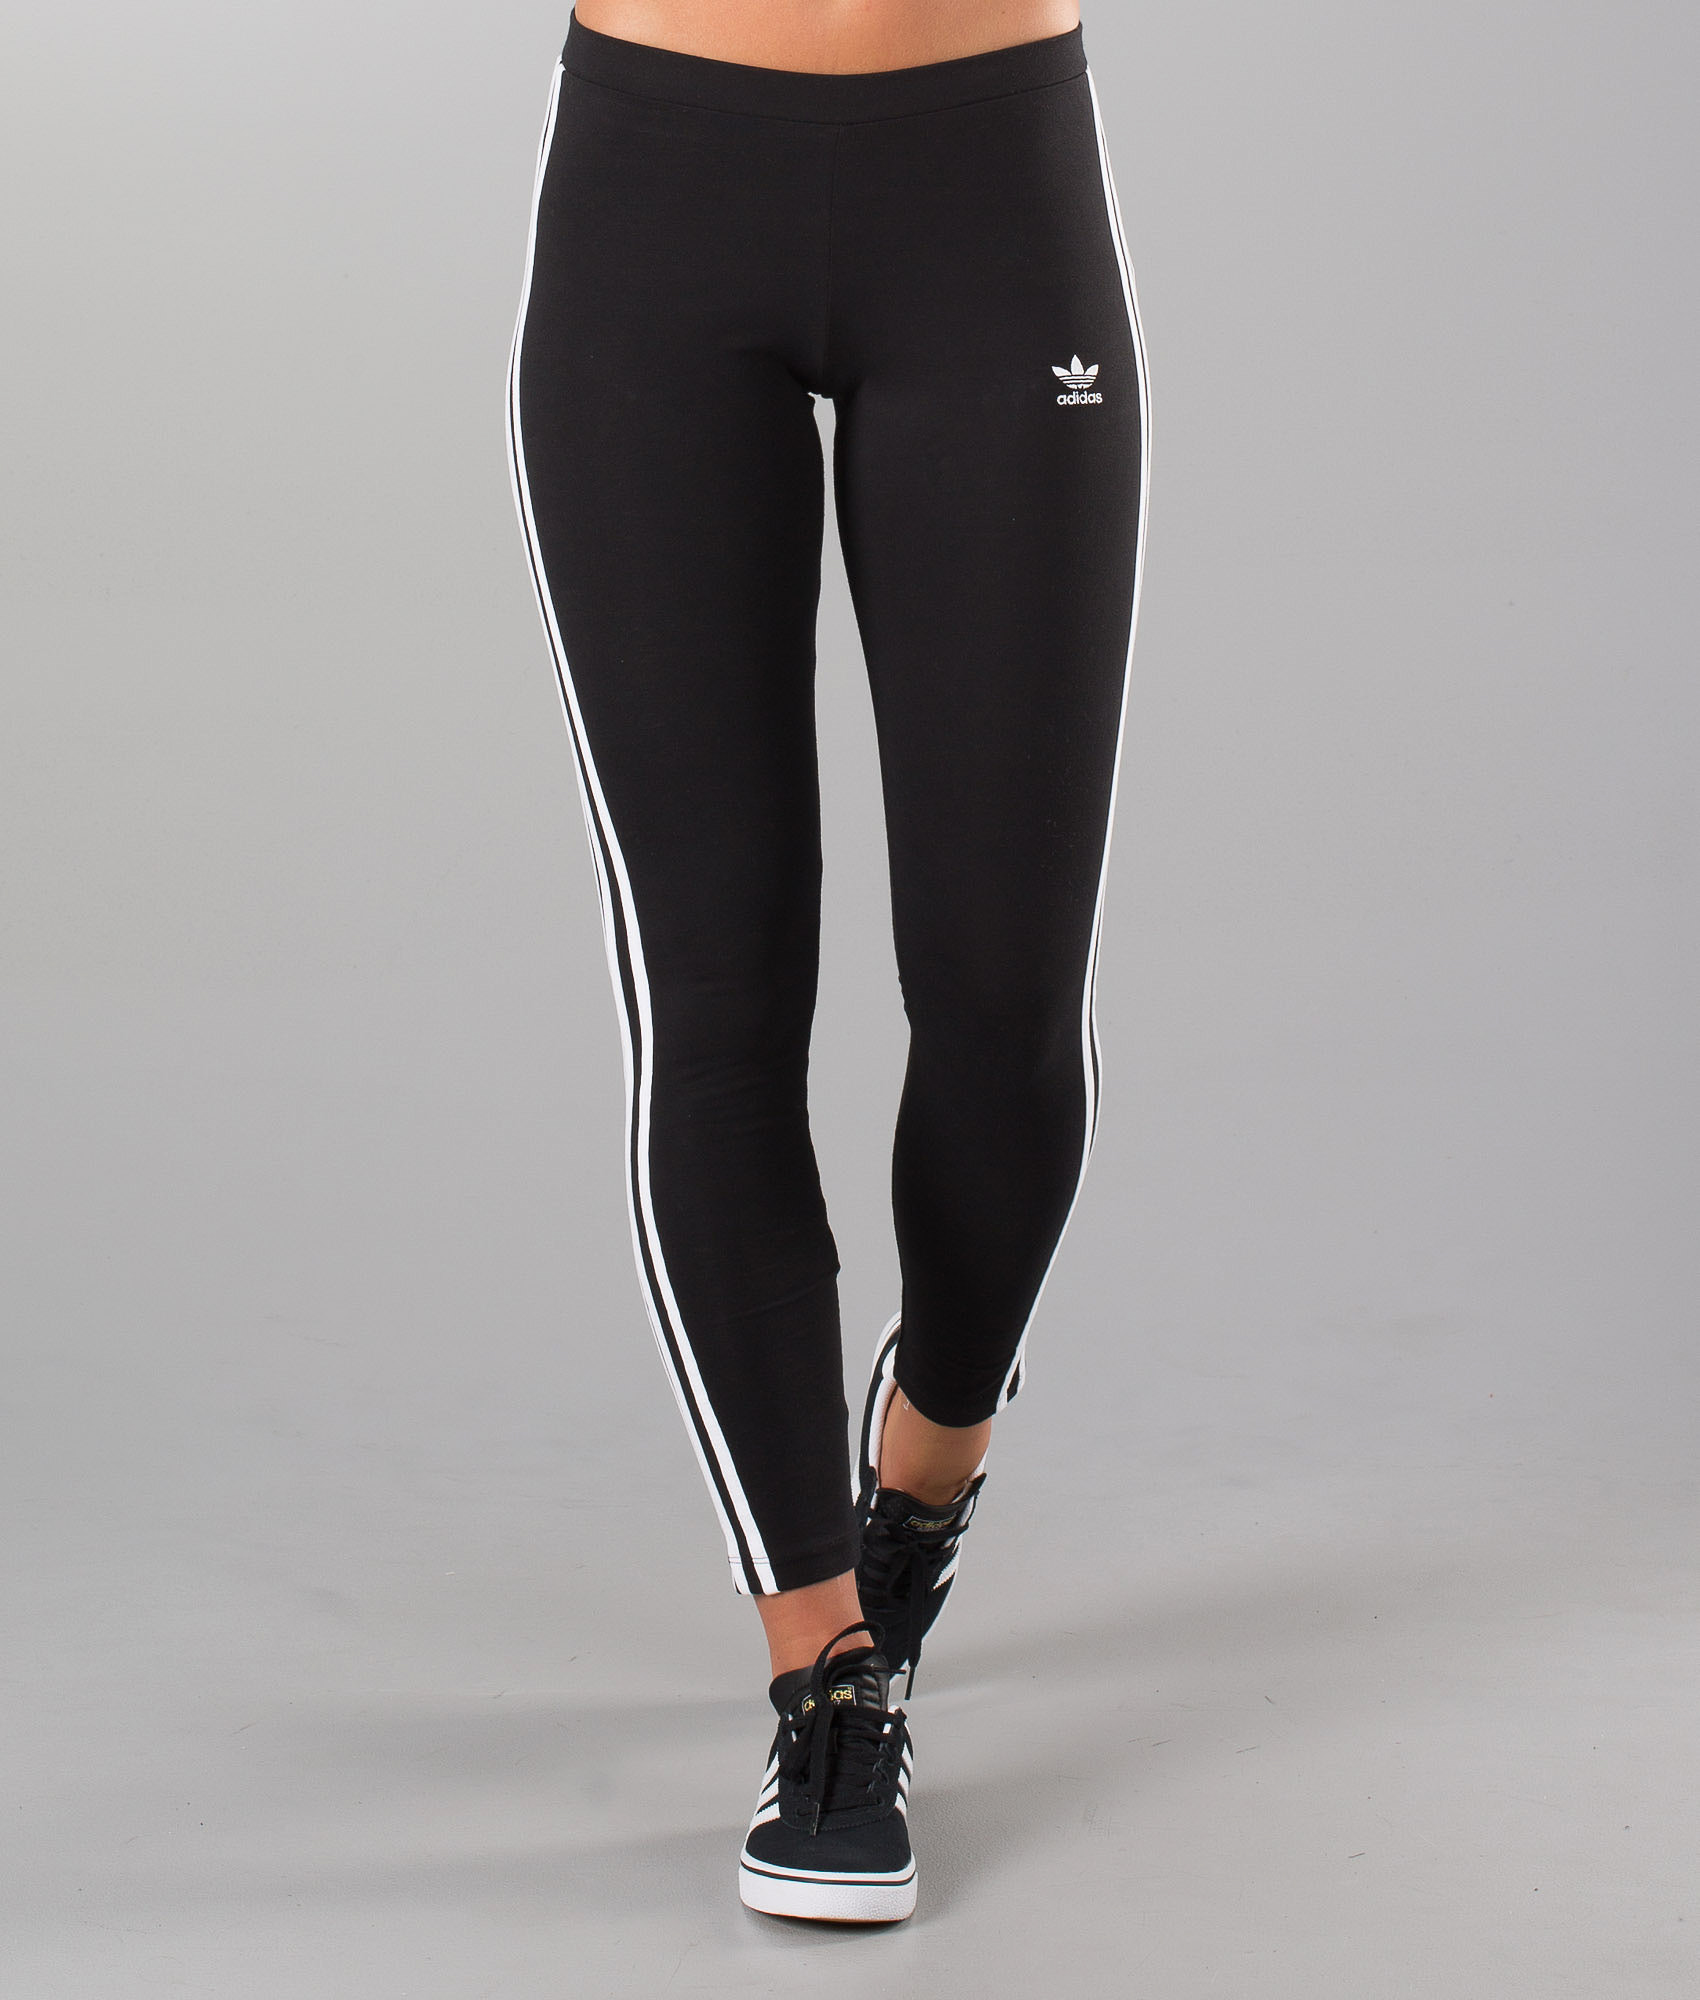 58abe5cc26 Adidas Originals 3-Stripes Leggings Black - Ridestore.com